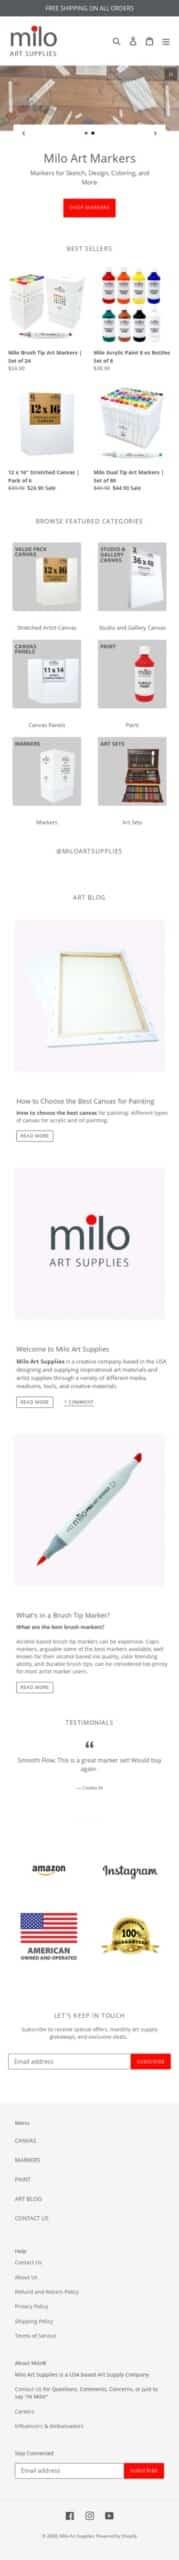 Milo Art Supplies Coupon